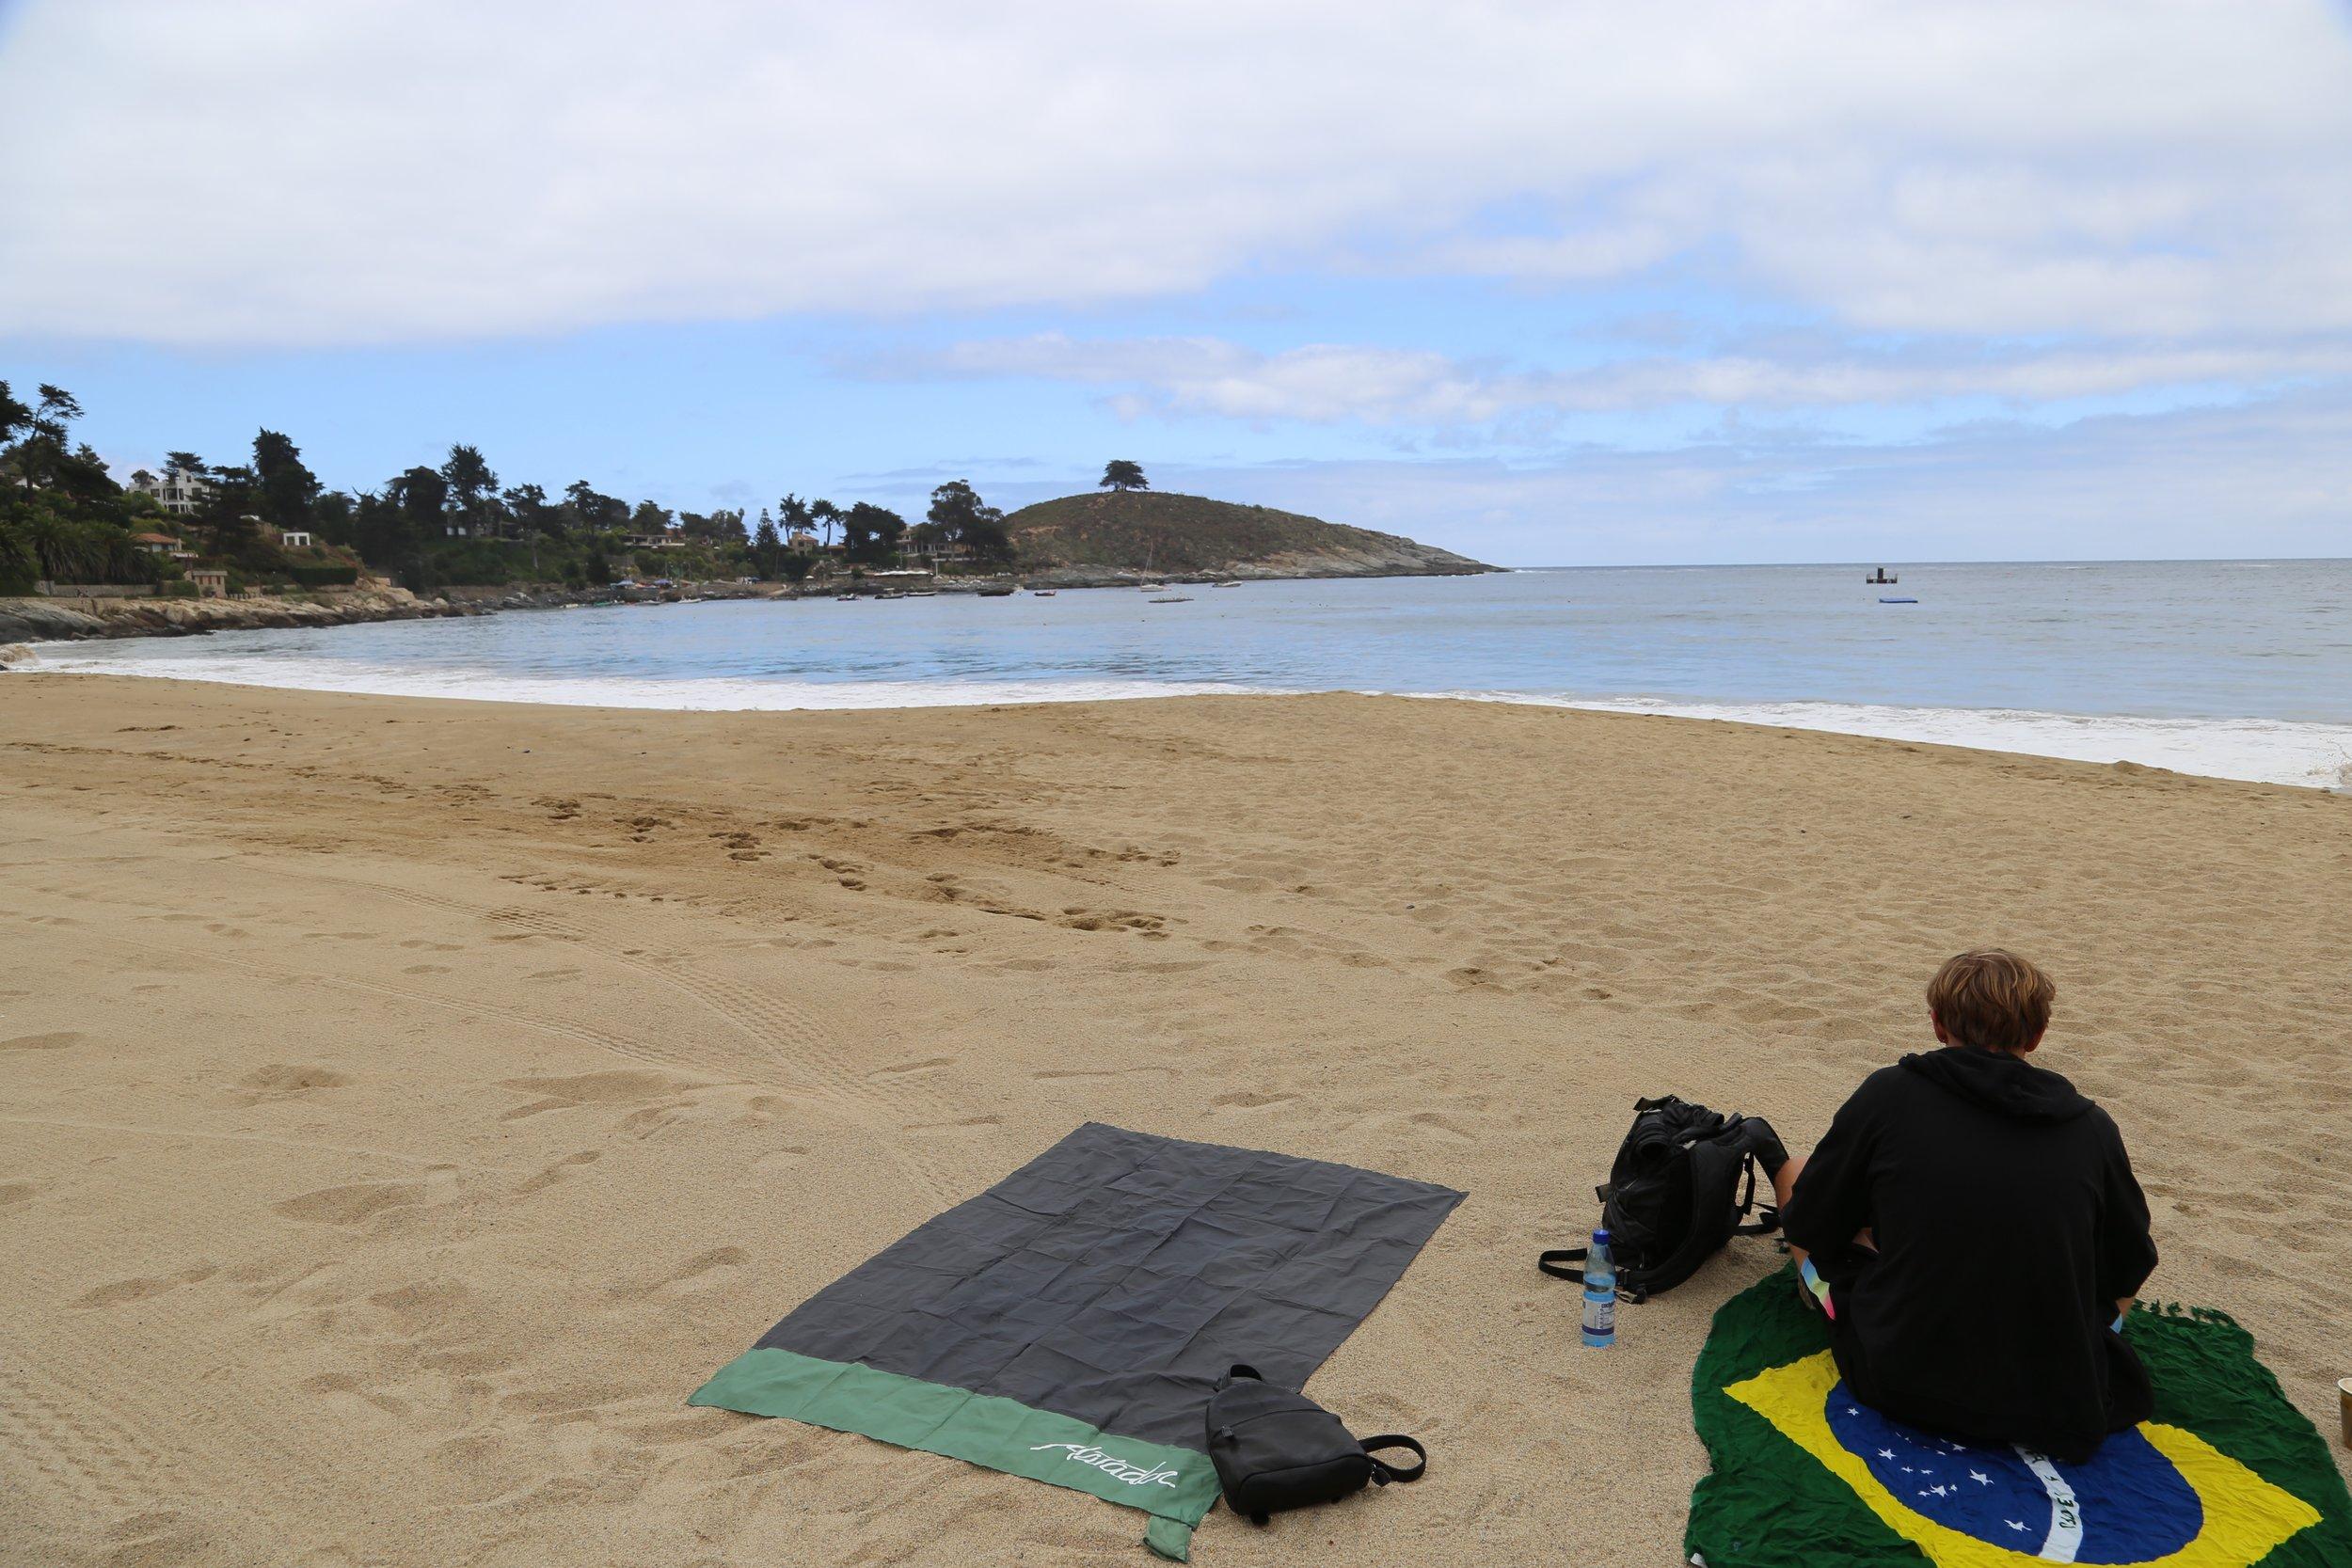 Zapallar beach all to ourselves.